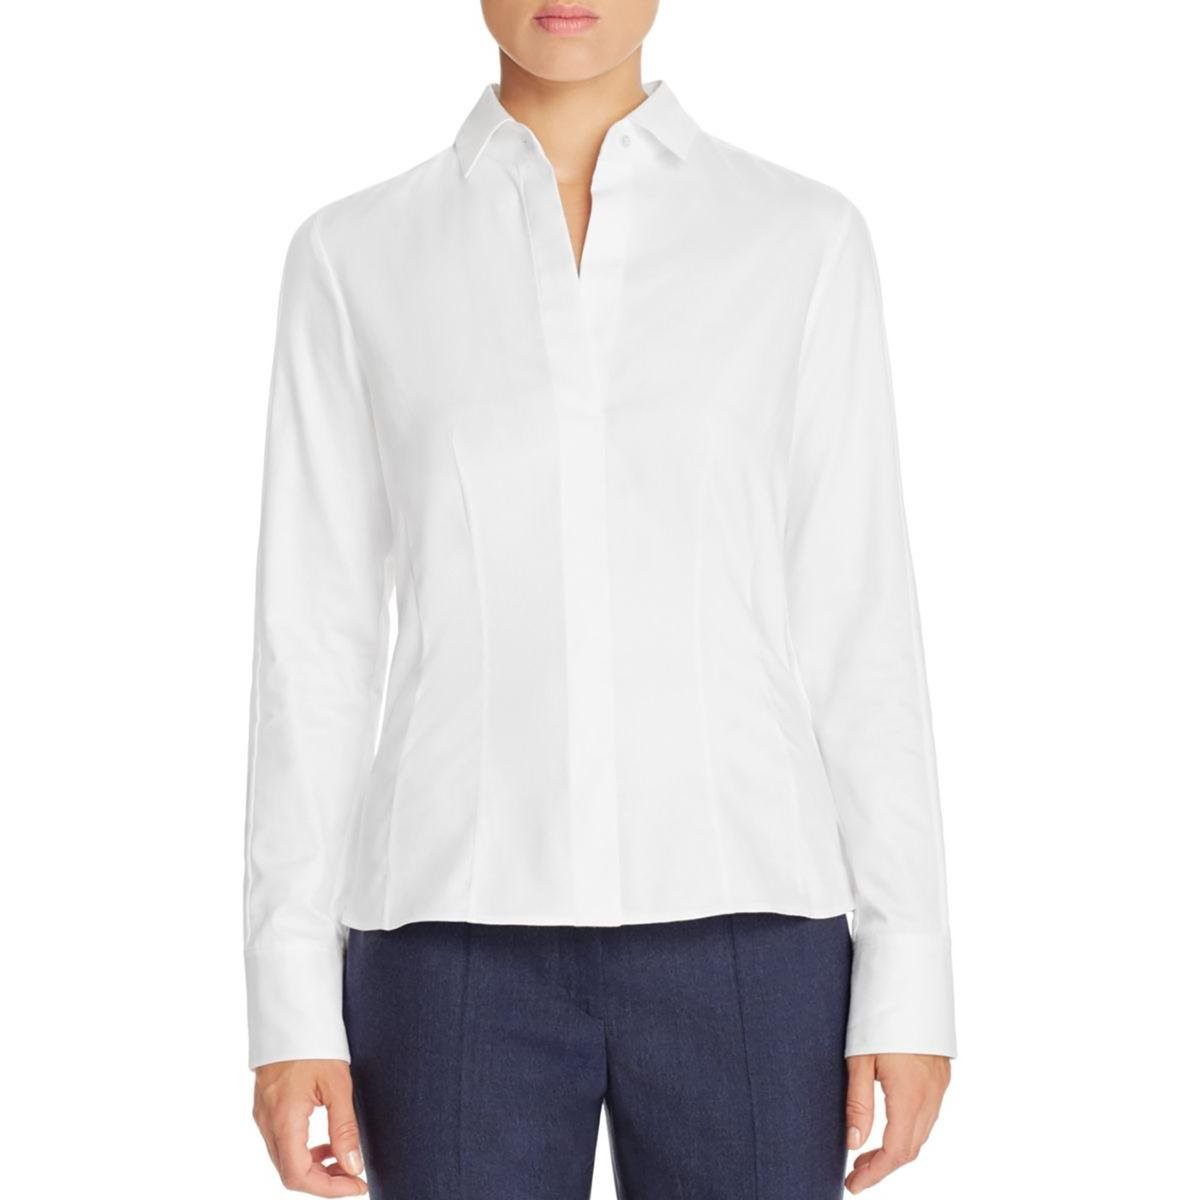 BOSS Hugo Boss Womens Bashina6 Side Zip Cotton Button-Down Top White 12 by HUGO BOSS (Image #1)